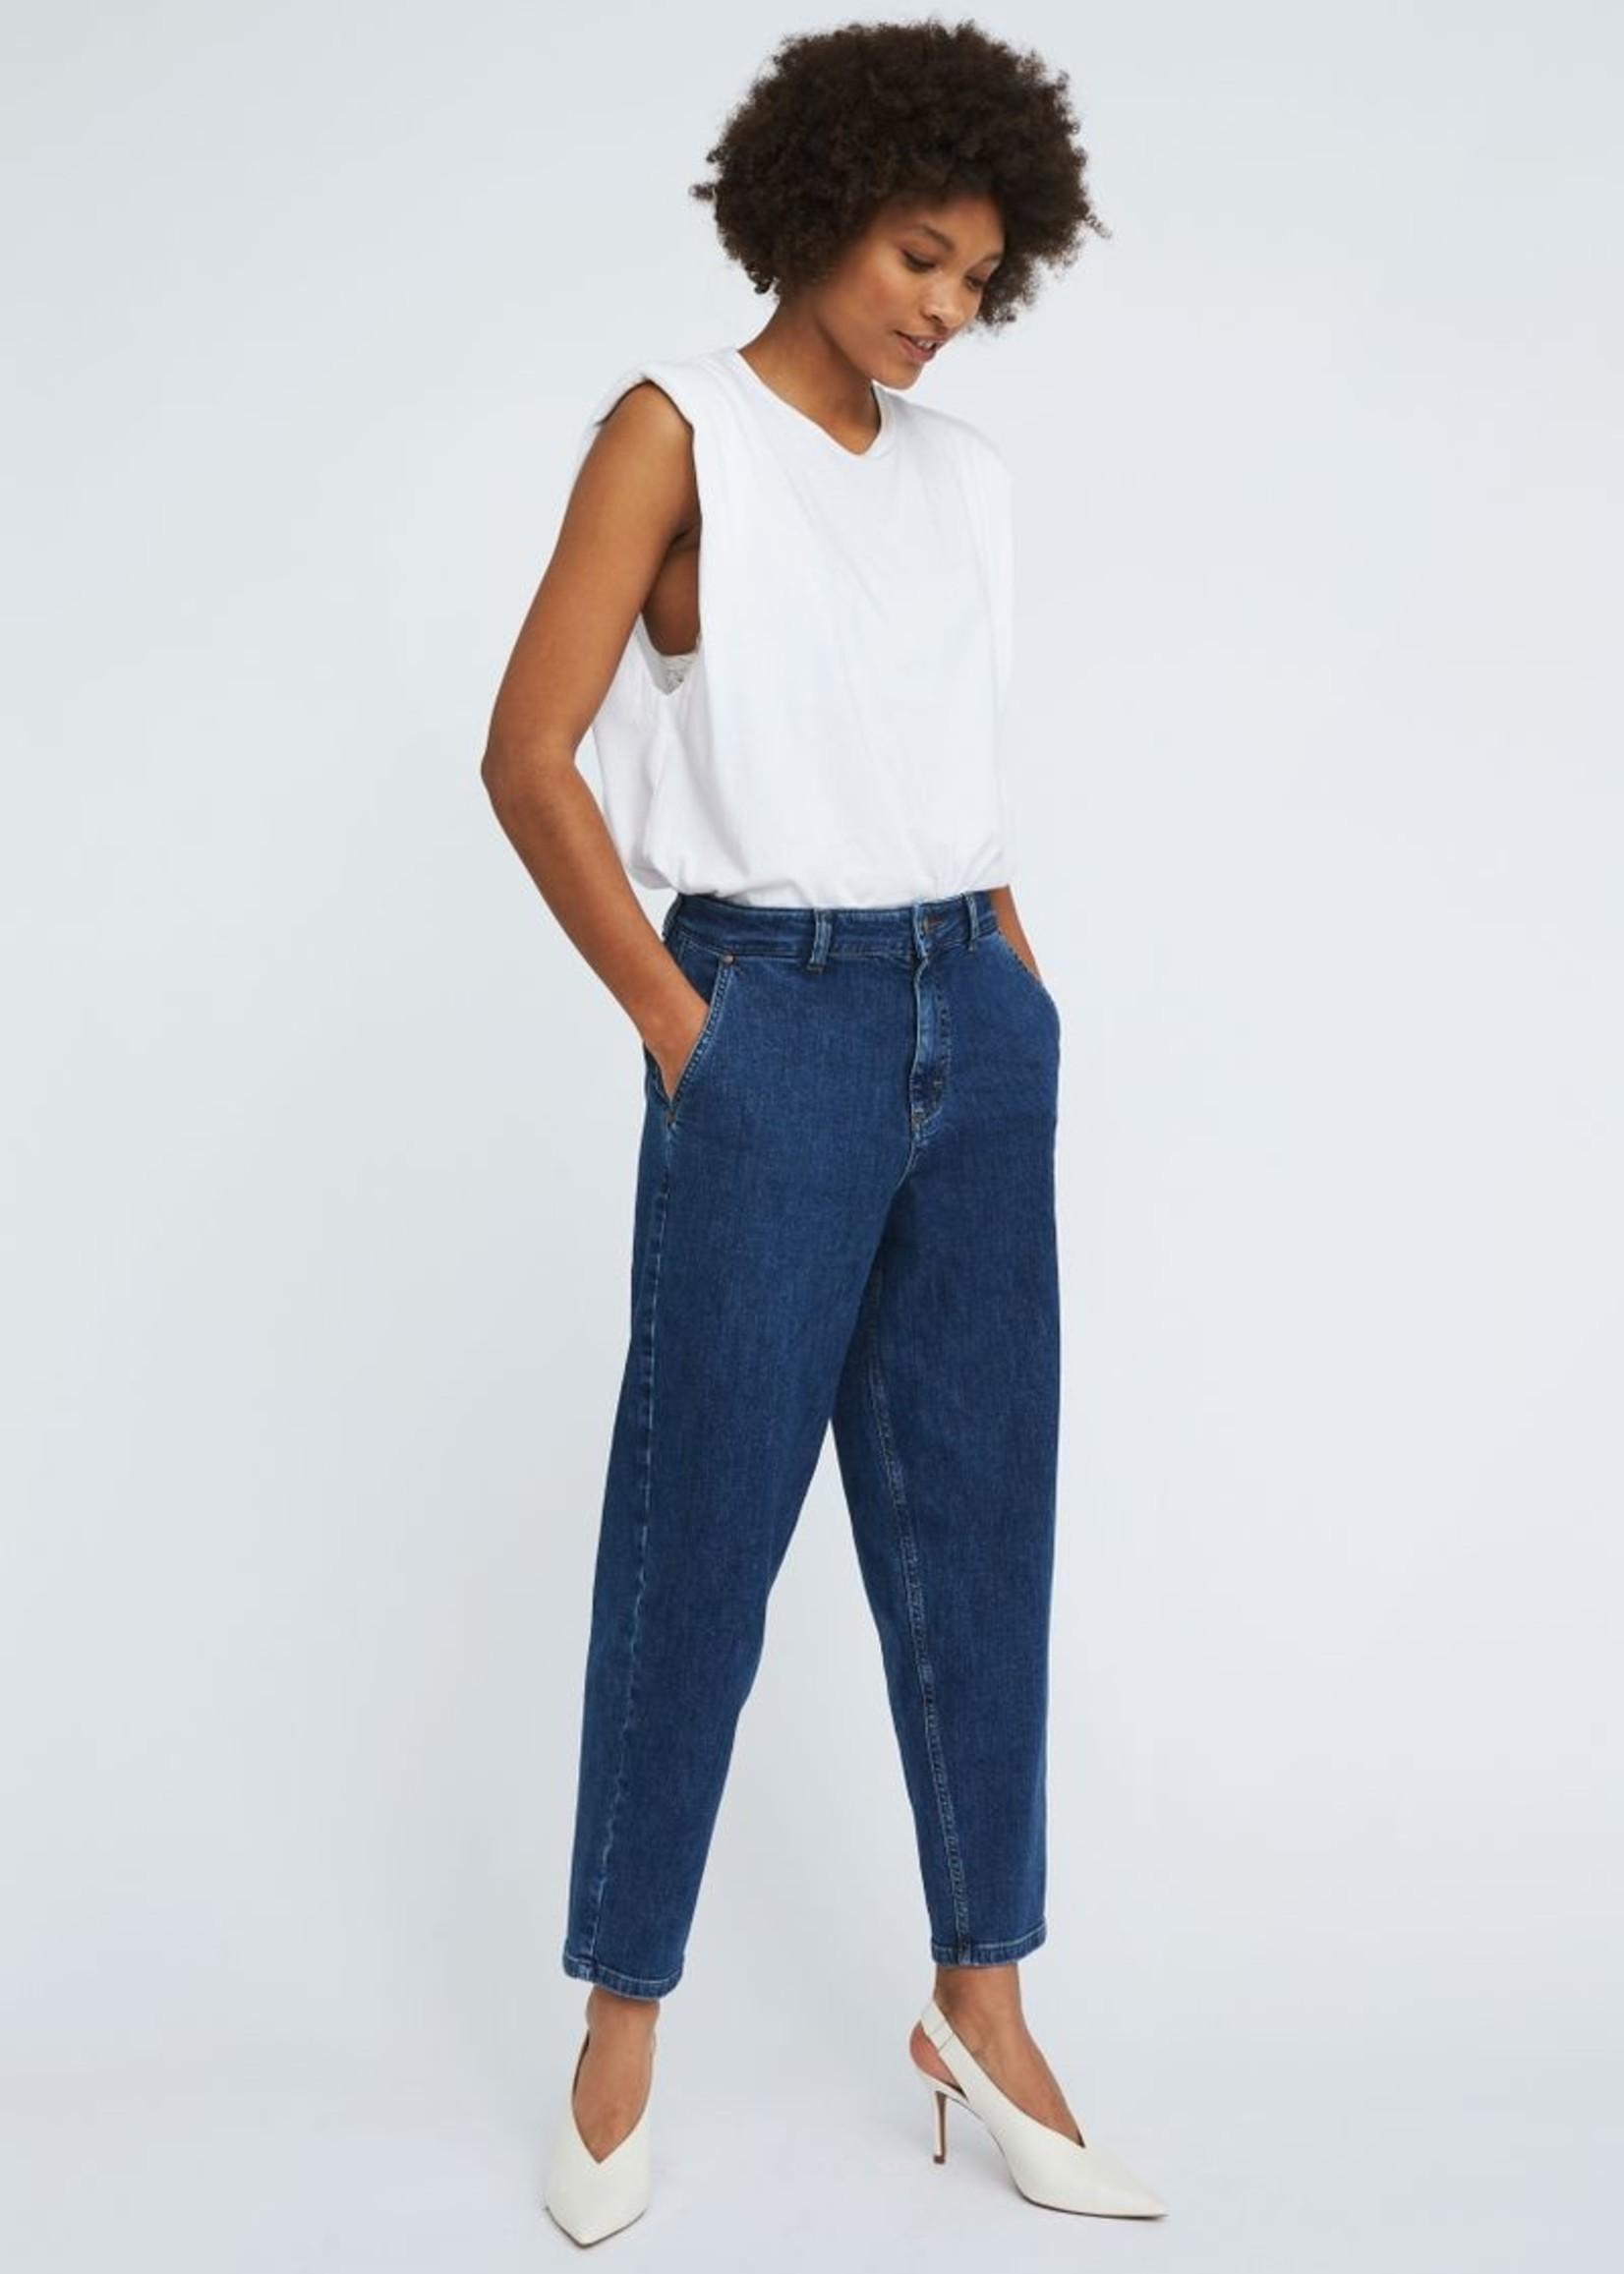 Five Units Alba Jeans